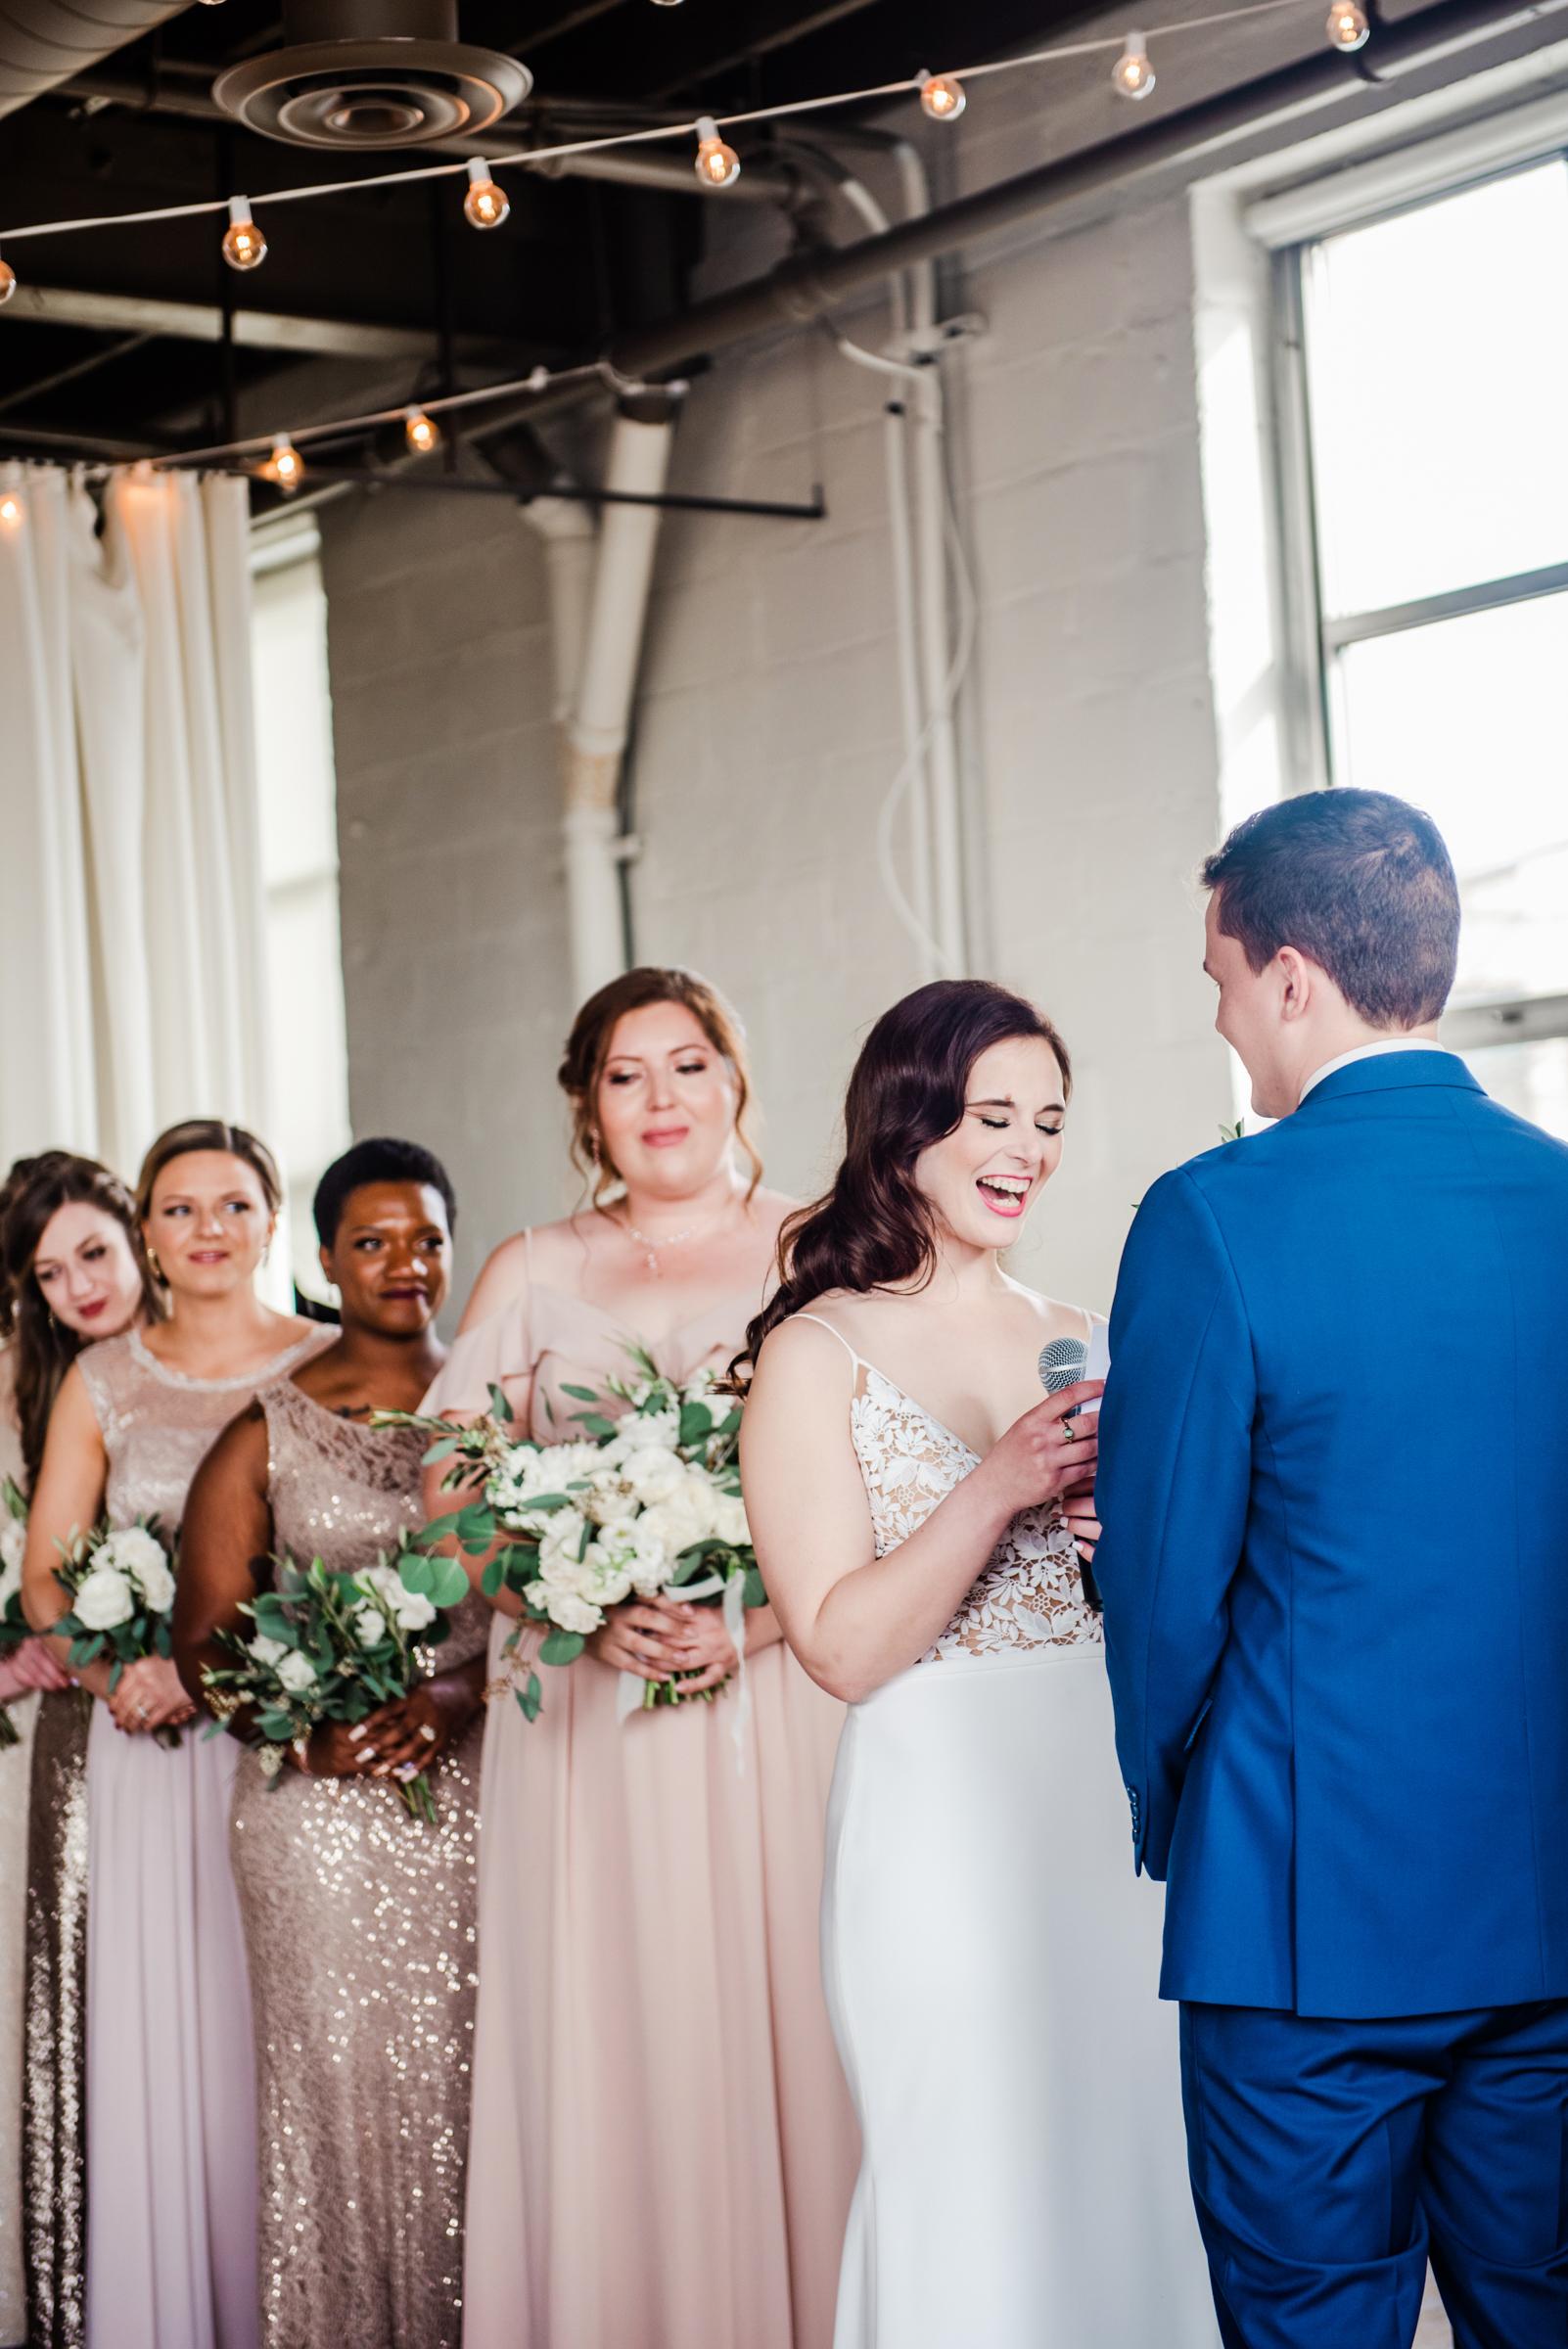 The_Arbor_LoftRochester_Wedding_JILL_STUDIO_Rochester_NY_Photographer_171048.jpg